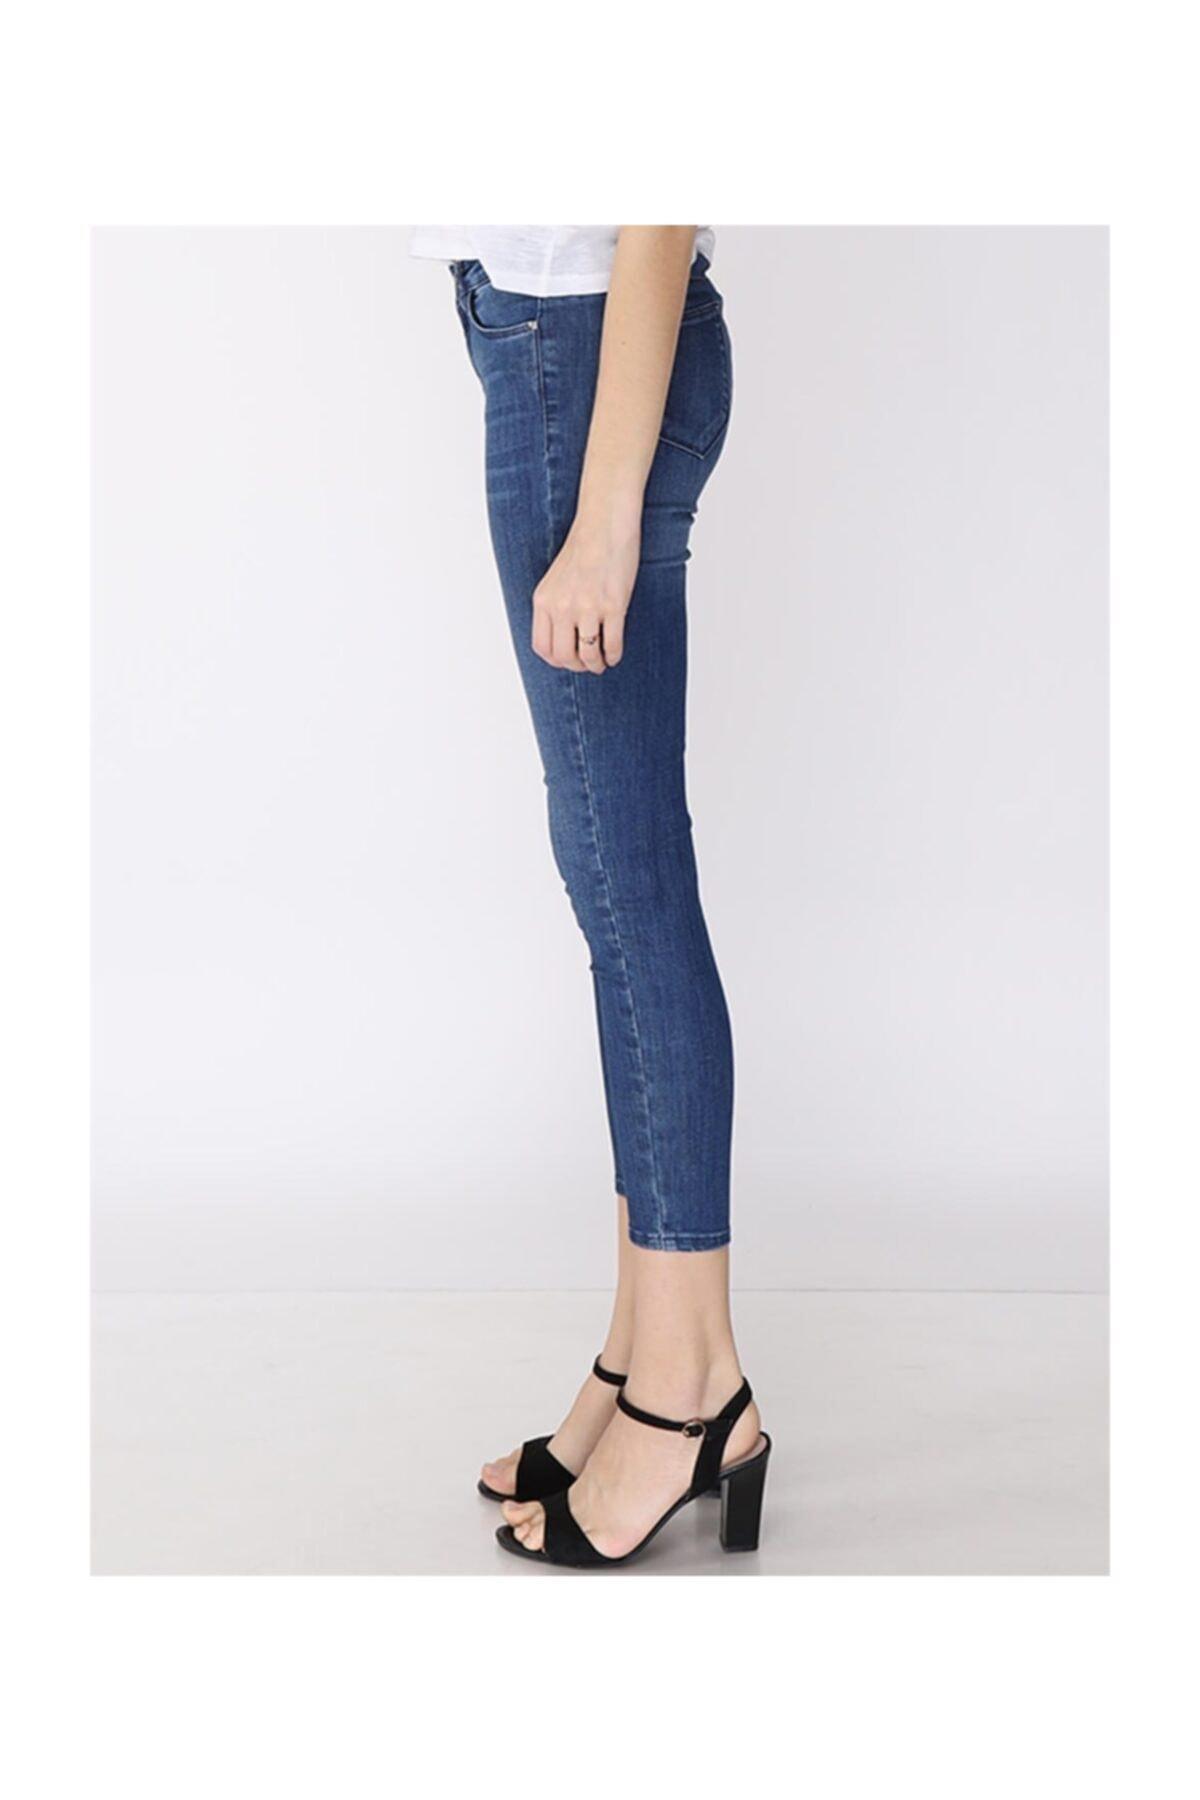 Twister Jeans Mındy Kadın Mavi Jean 2